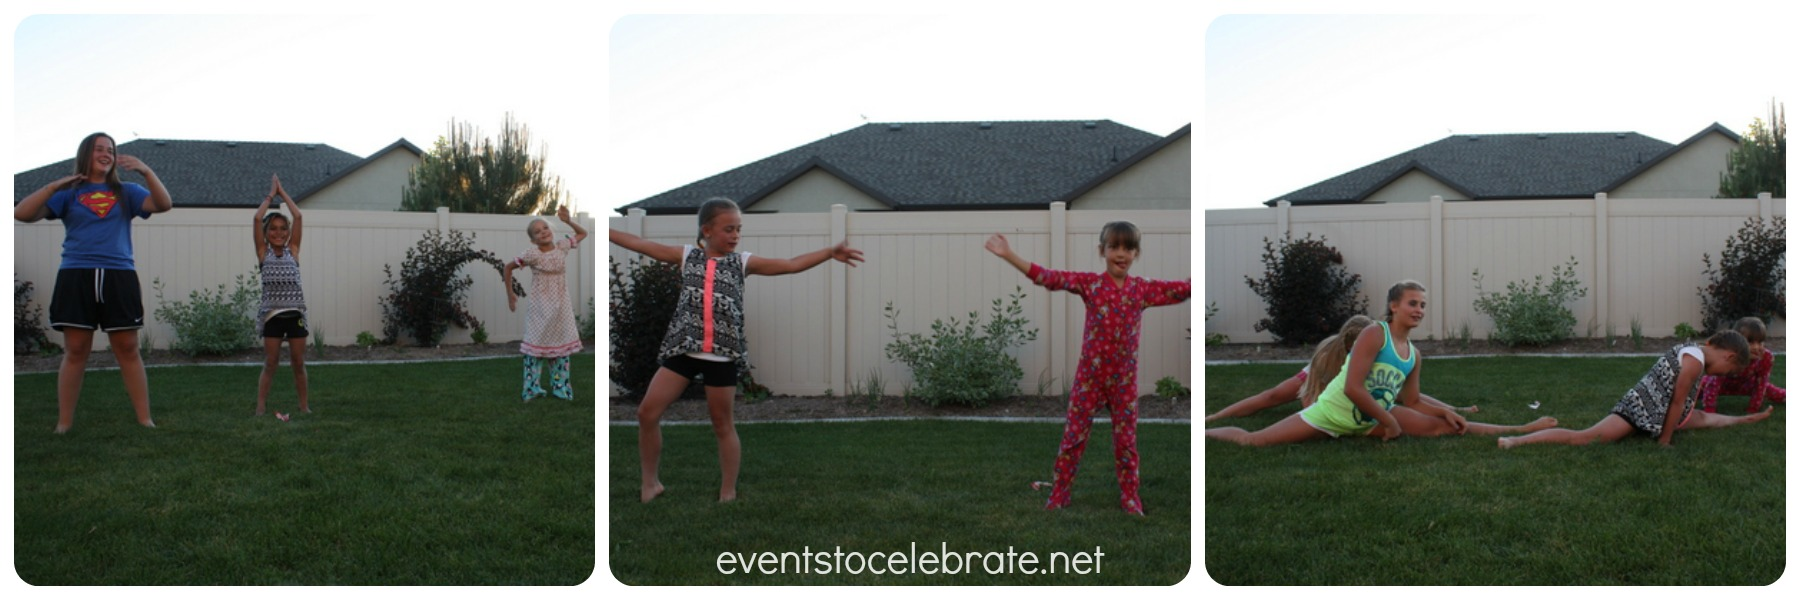 Slumber Party Activities - Dance Choreography